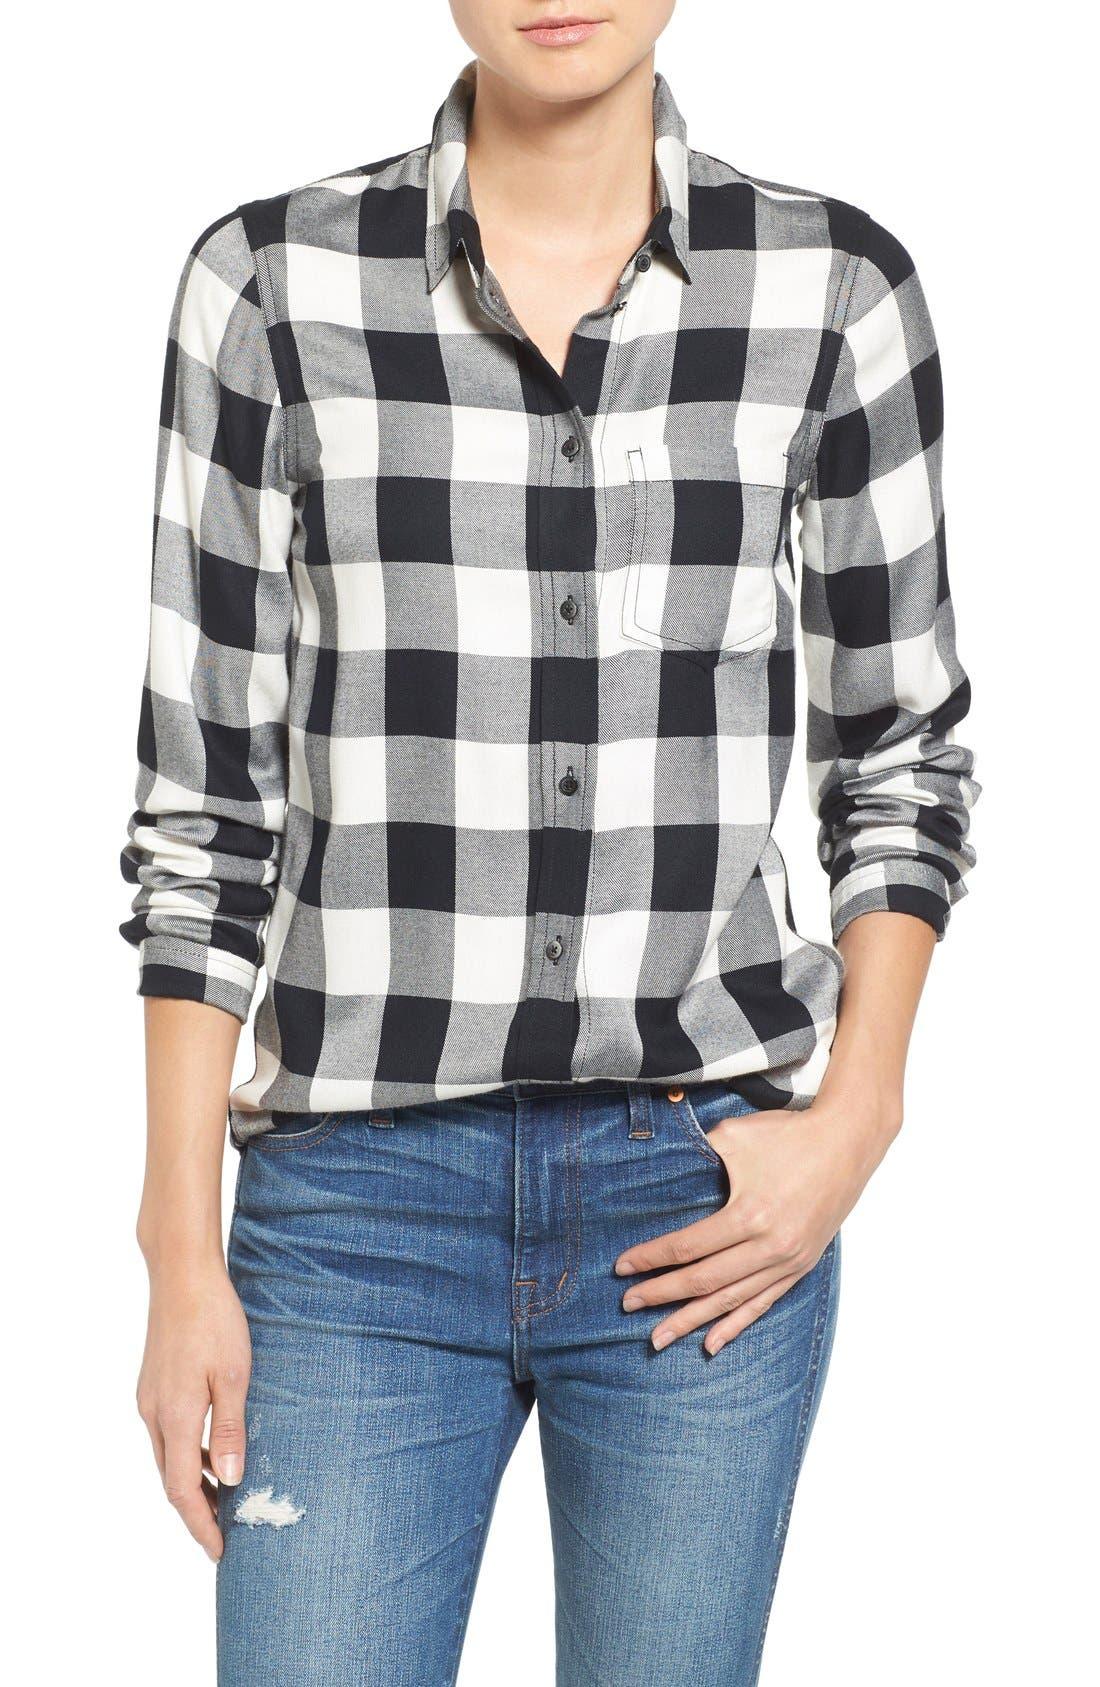 Alternate Image 1 Selected - Madewell 'Ex Boyfriend' Buffalo Check Slim Shirt